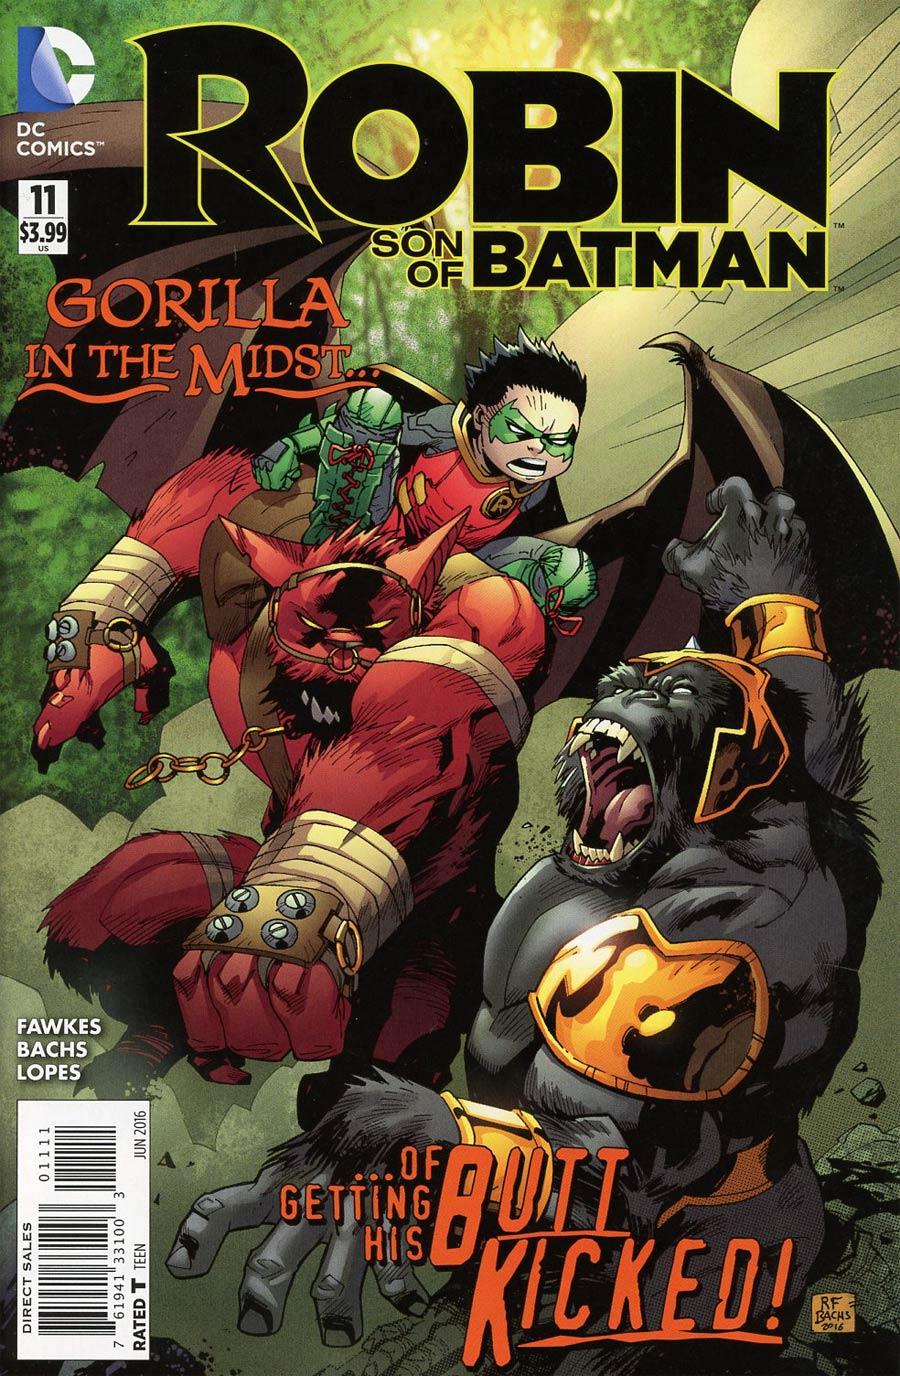 Robin Son Of Batman #11 Cover A Regular Patrick Gleason Cover